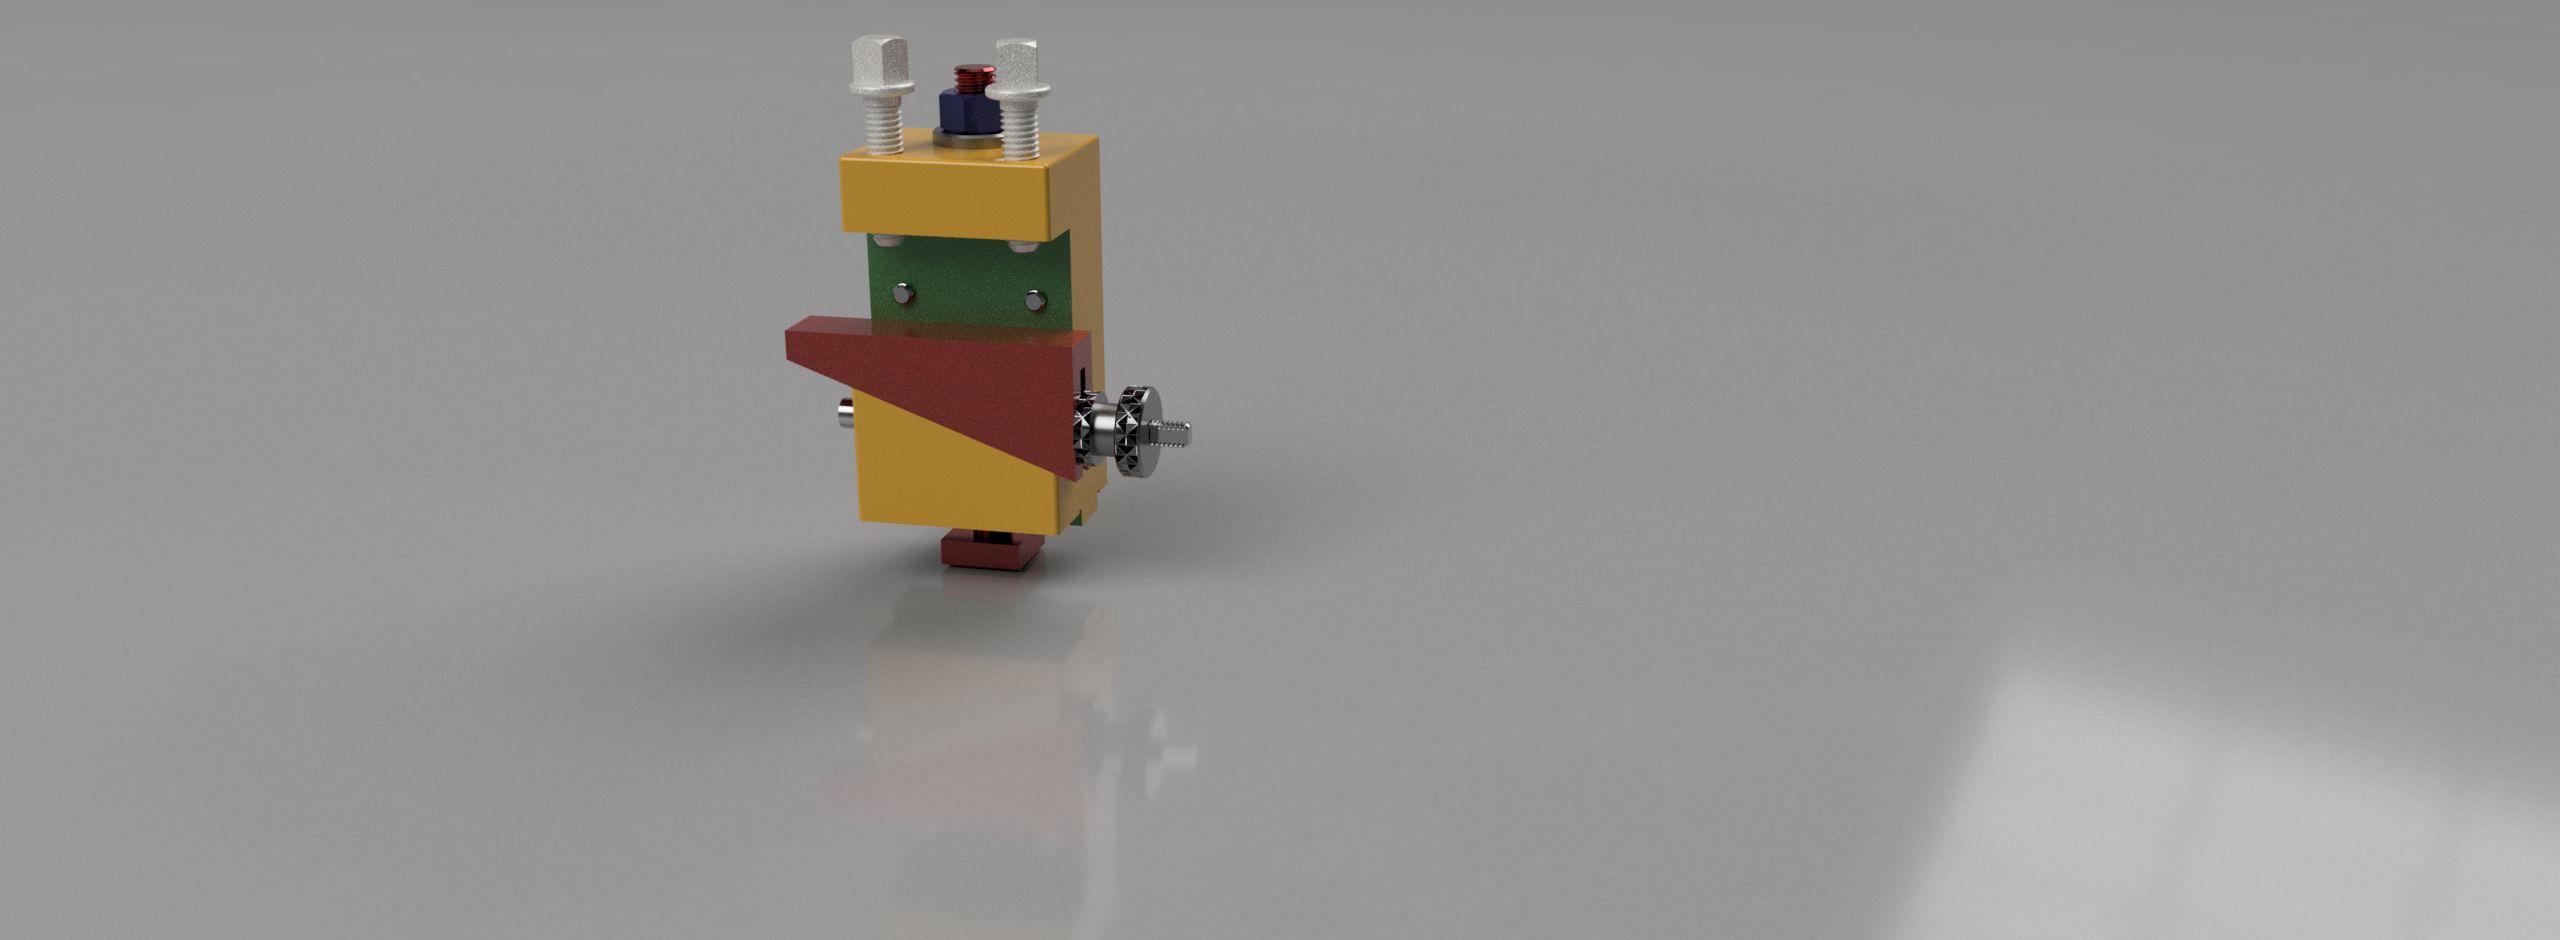 Tool-post-v15-3500-3500